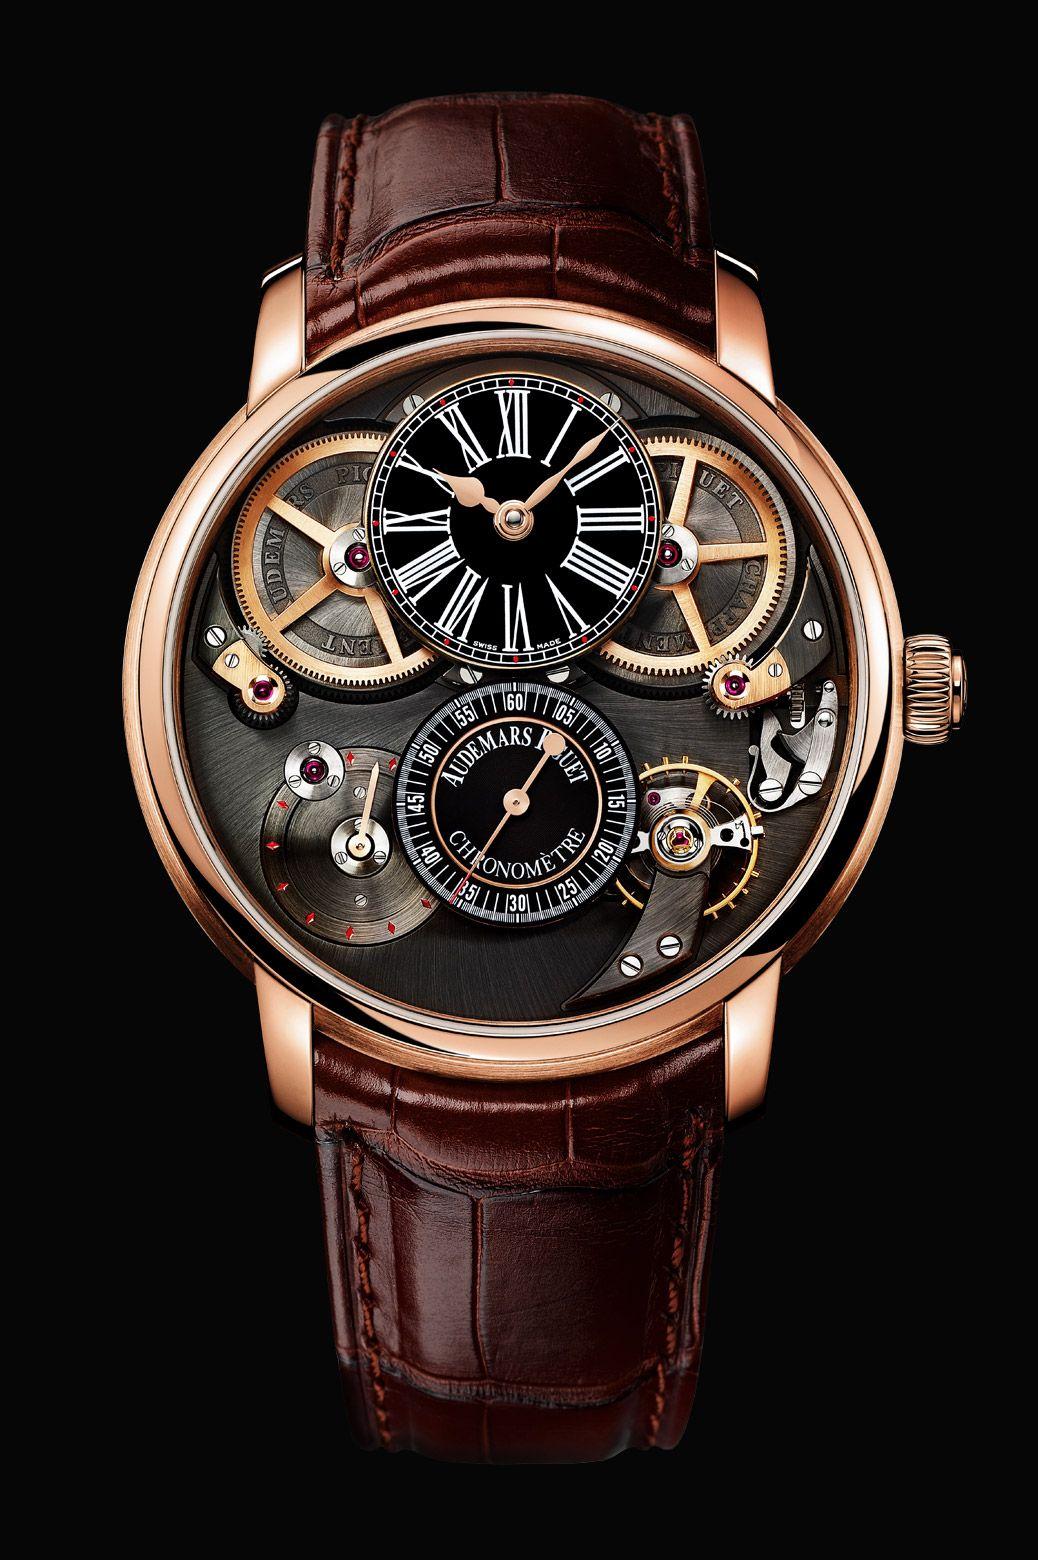 Audemars Piguet's Jules Audemars Chronometer Watch with croco strap and pink gold case.  Price: 167,180.00 €